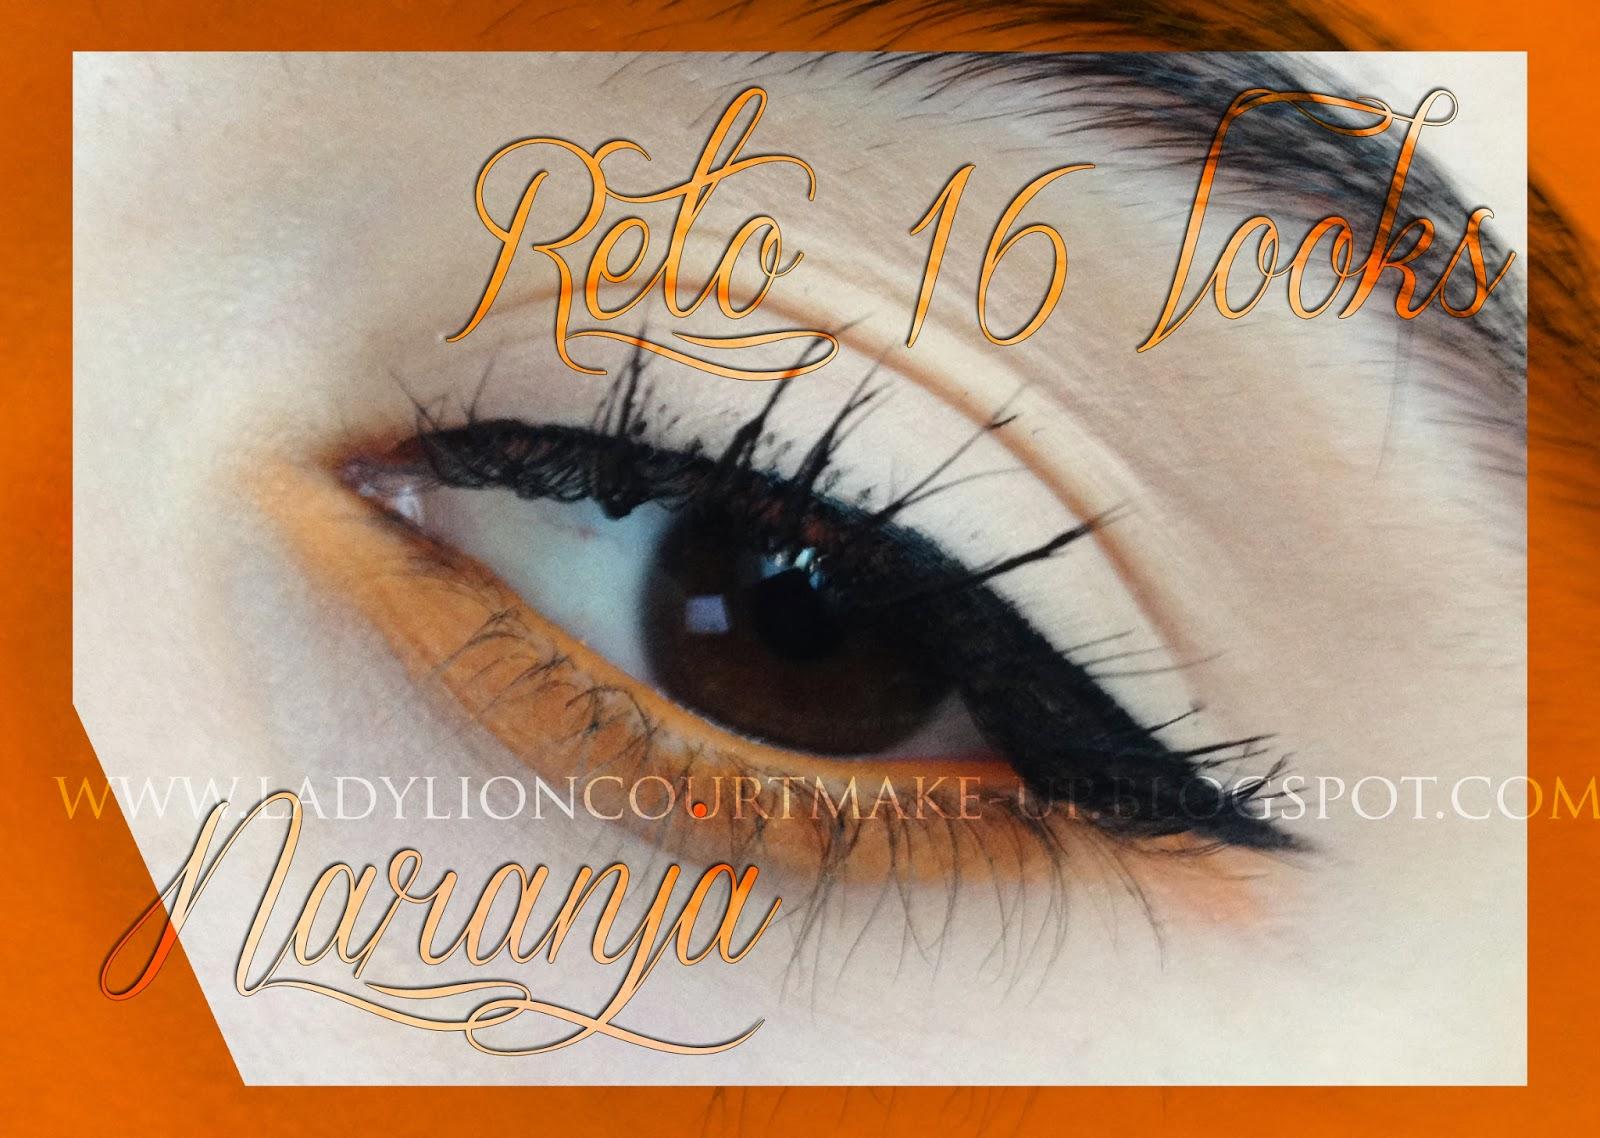 Reto 16 looks: Naranja